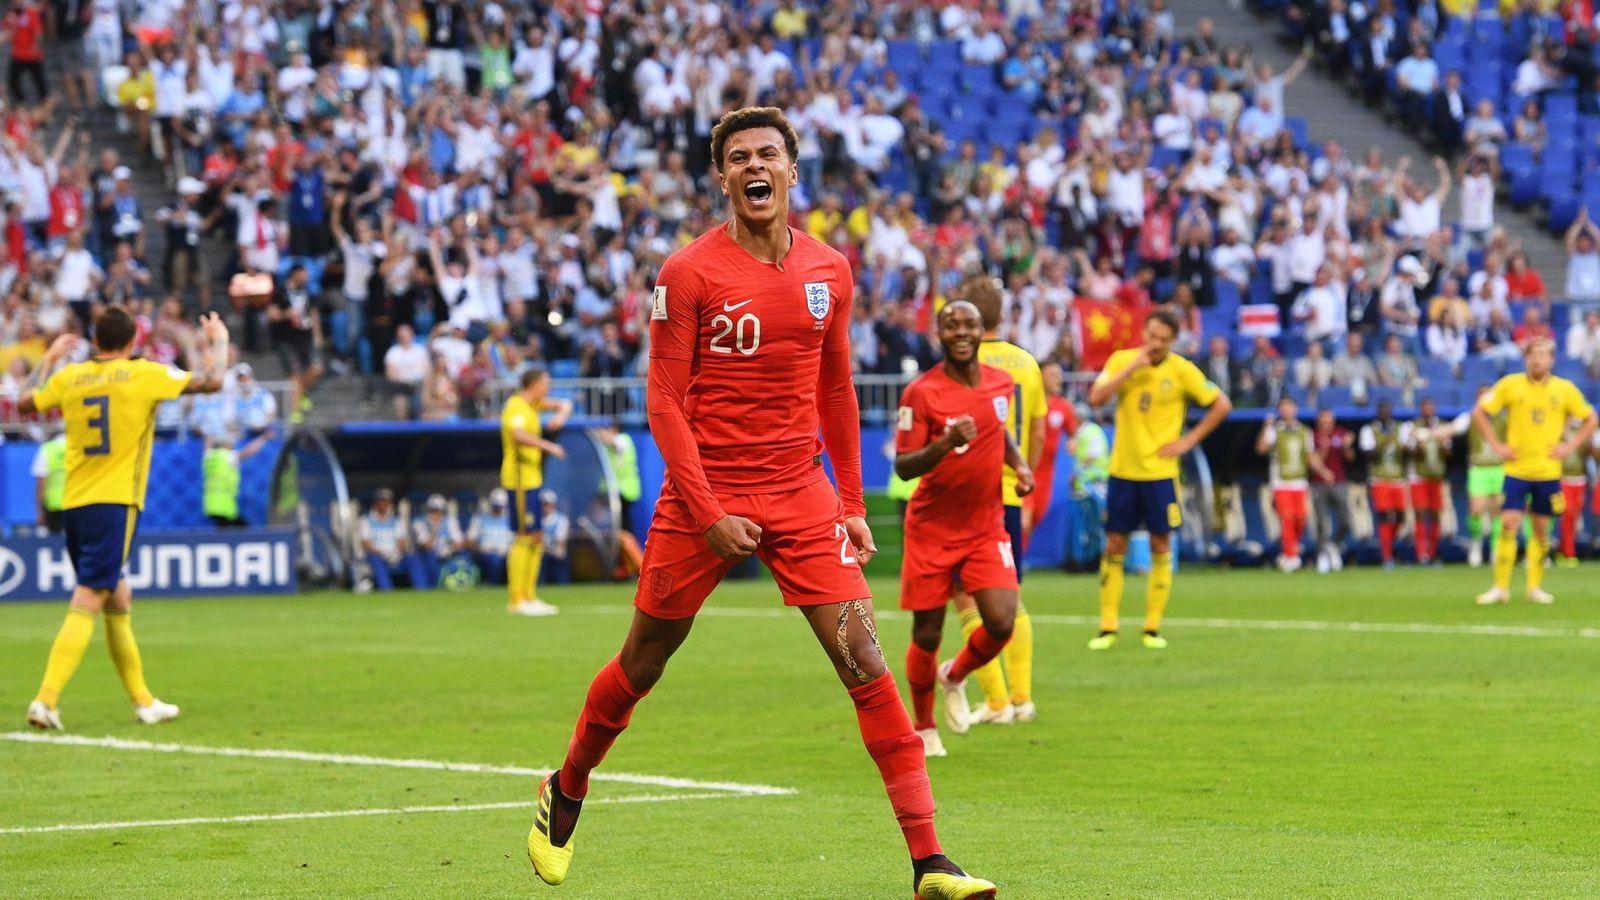 Foto: Dele Alli celebra el segundo gol de Inglaterra ante Suecia. (EFE)